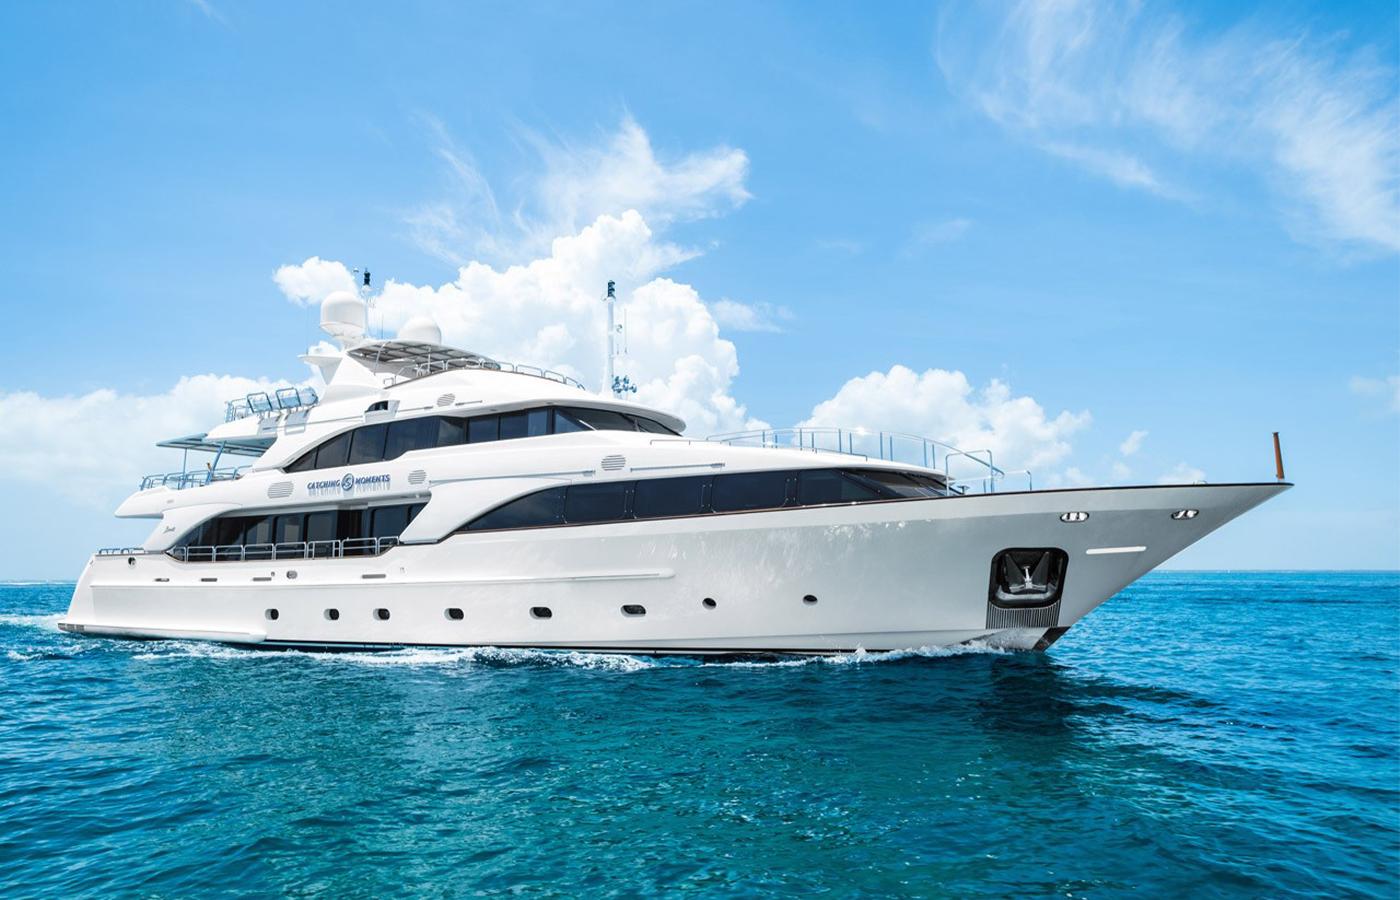 120 Benetti Motor Yacht 2015 Sold By Chris Daves + Will Noftsinger